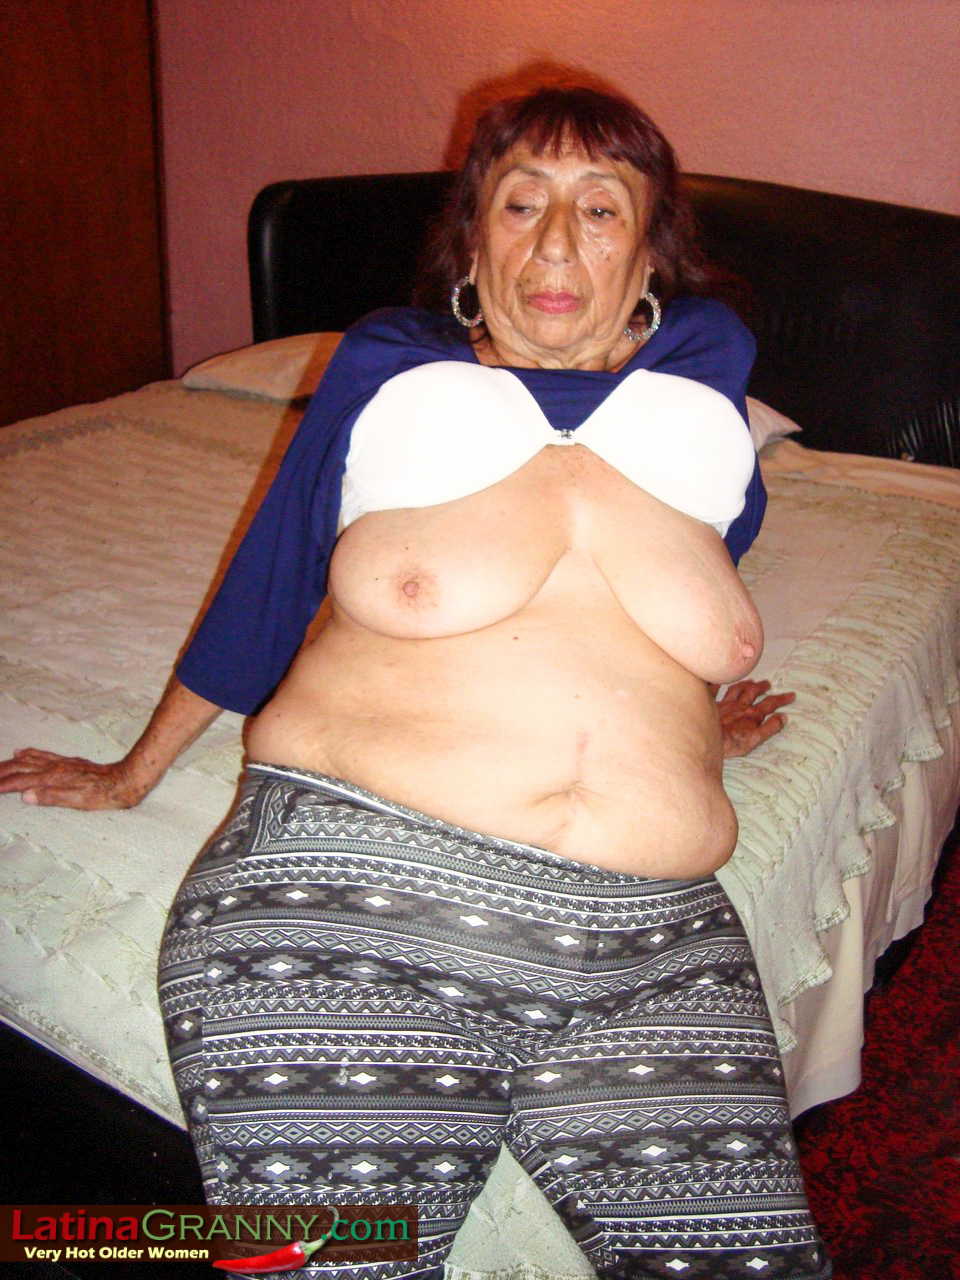 latina granny Amateur